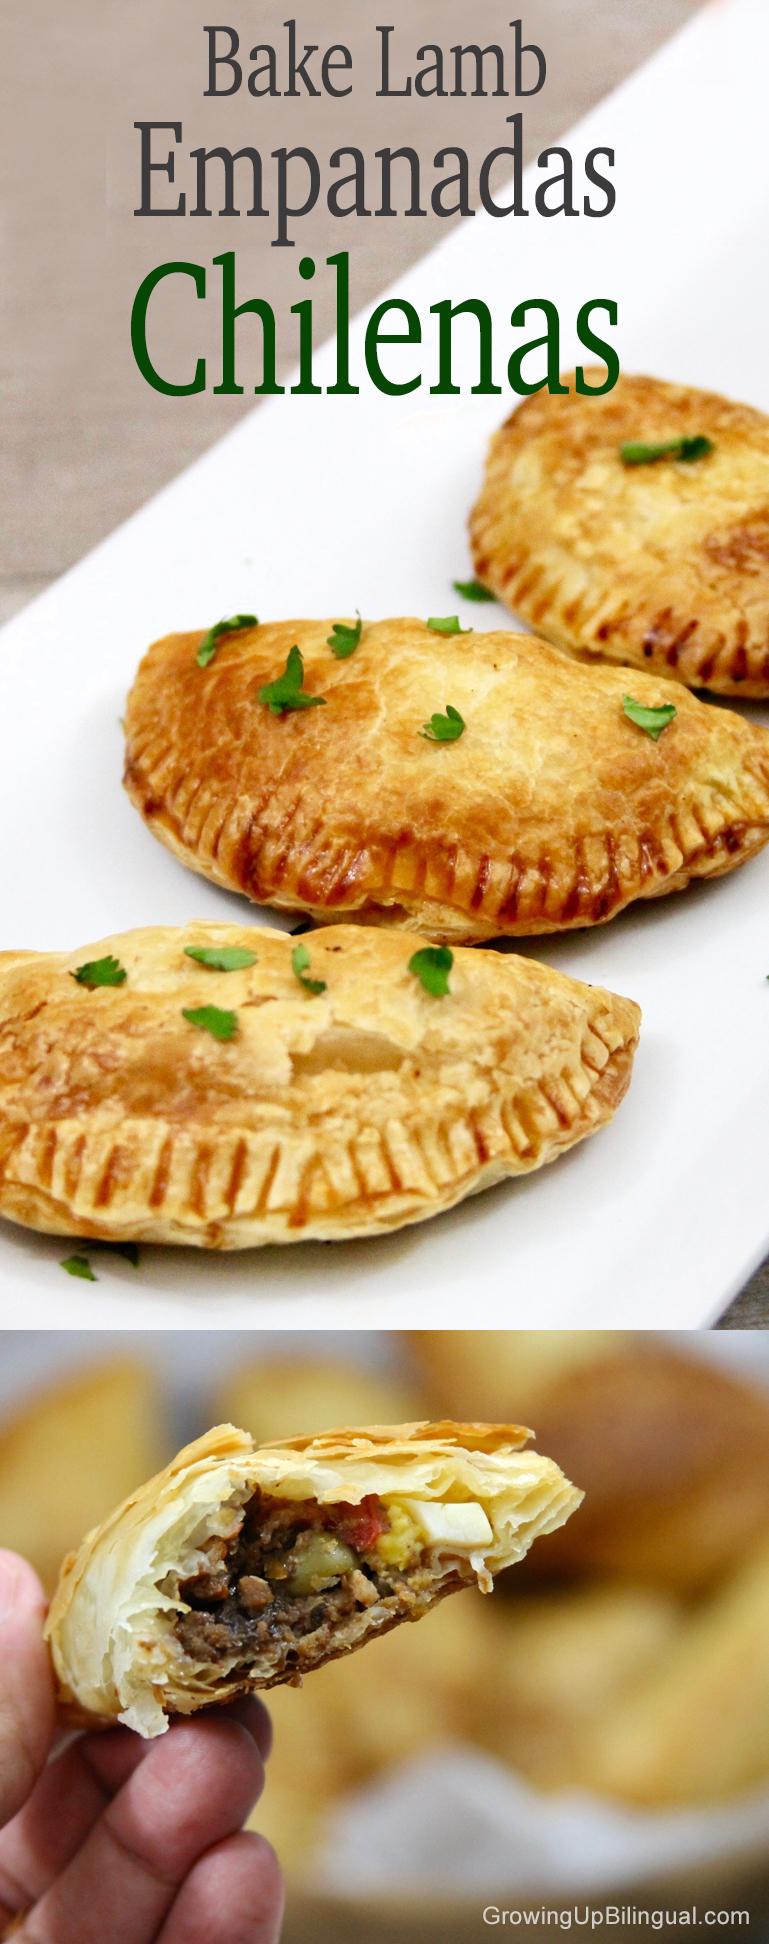 Baked Lamb Empanadas Chilenas